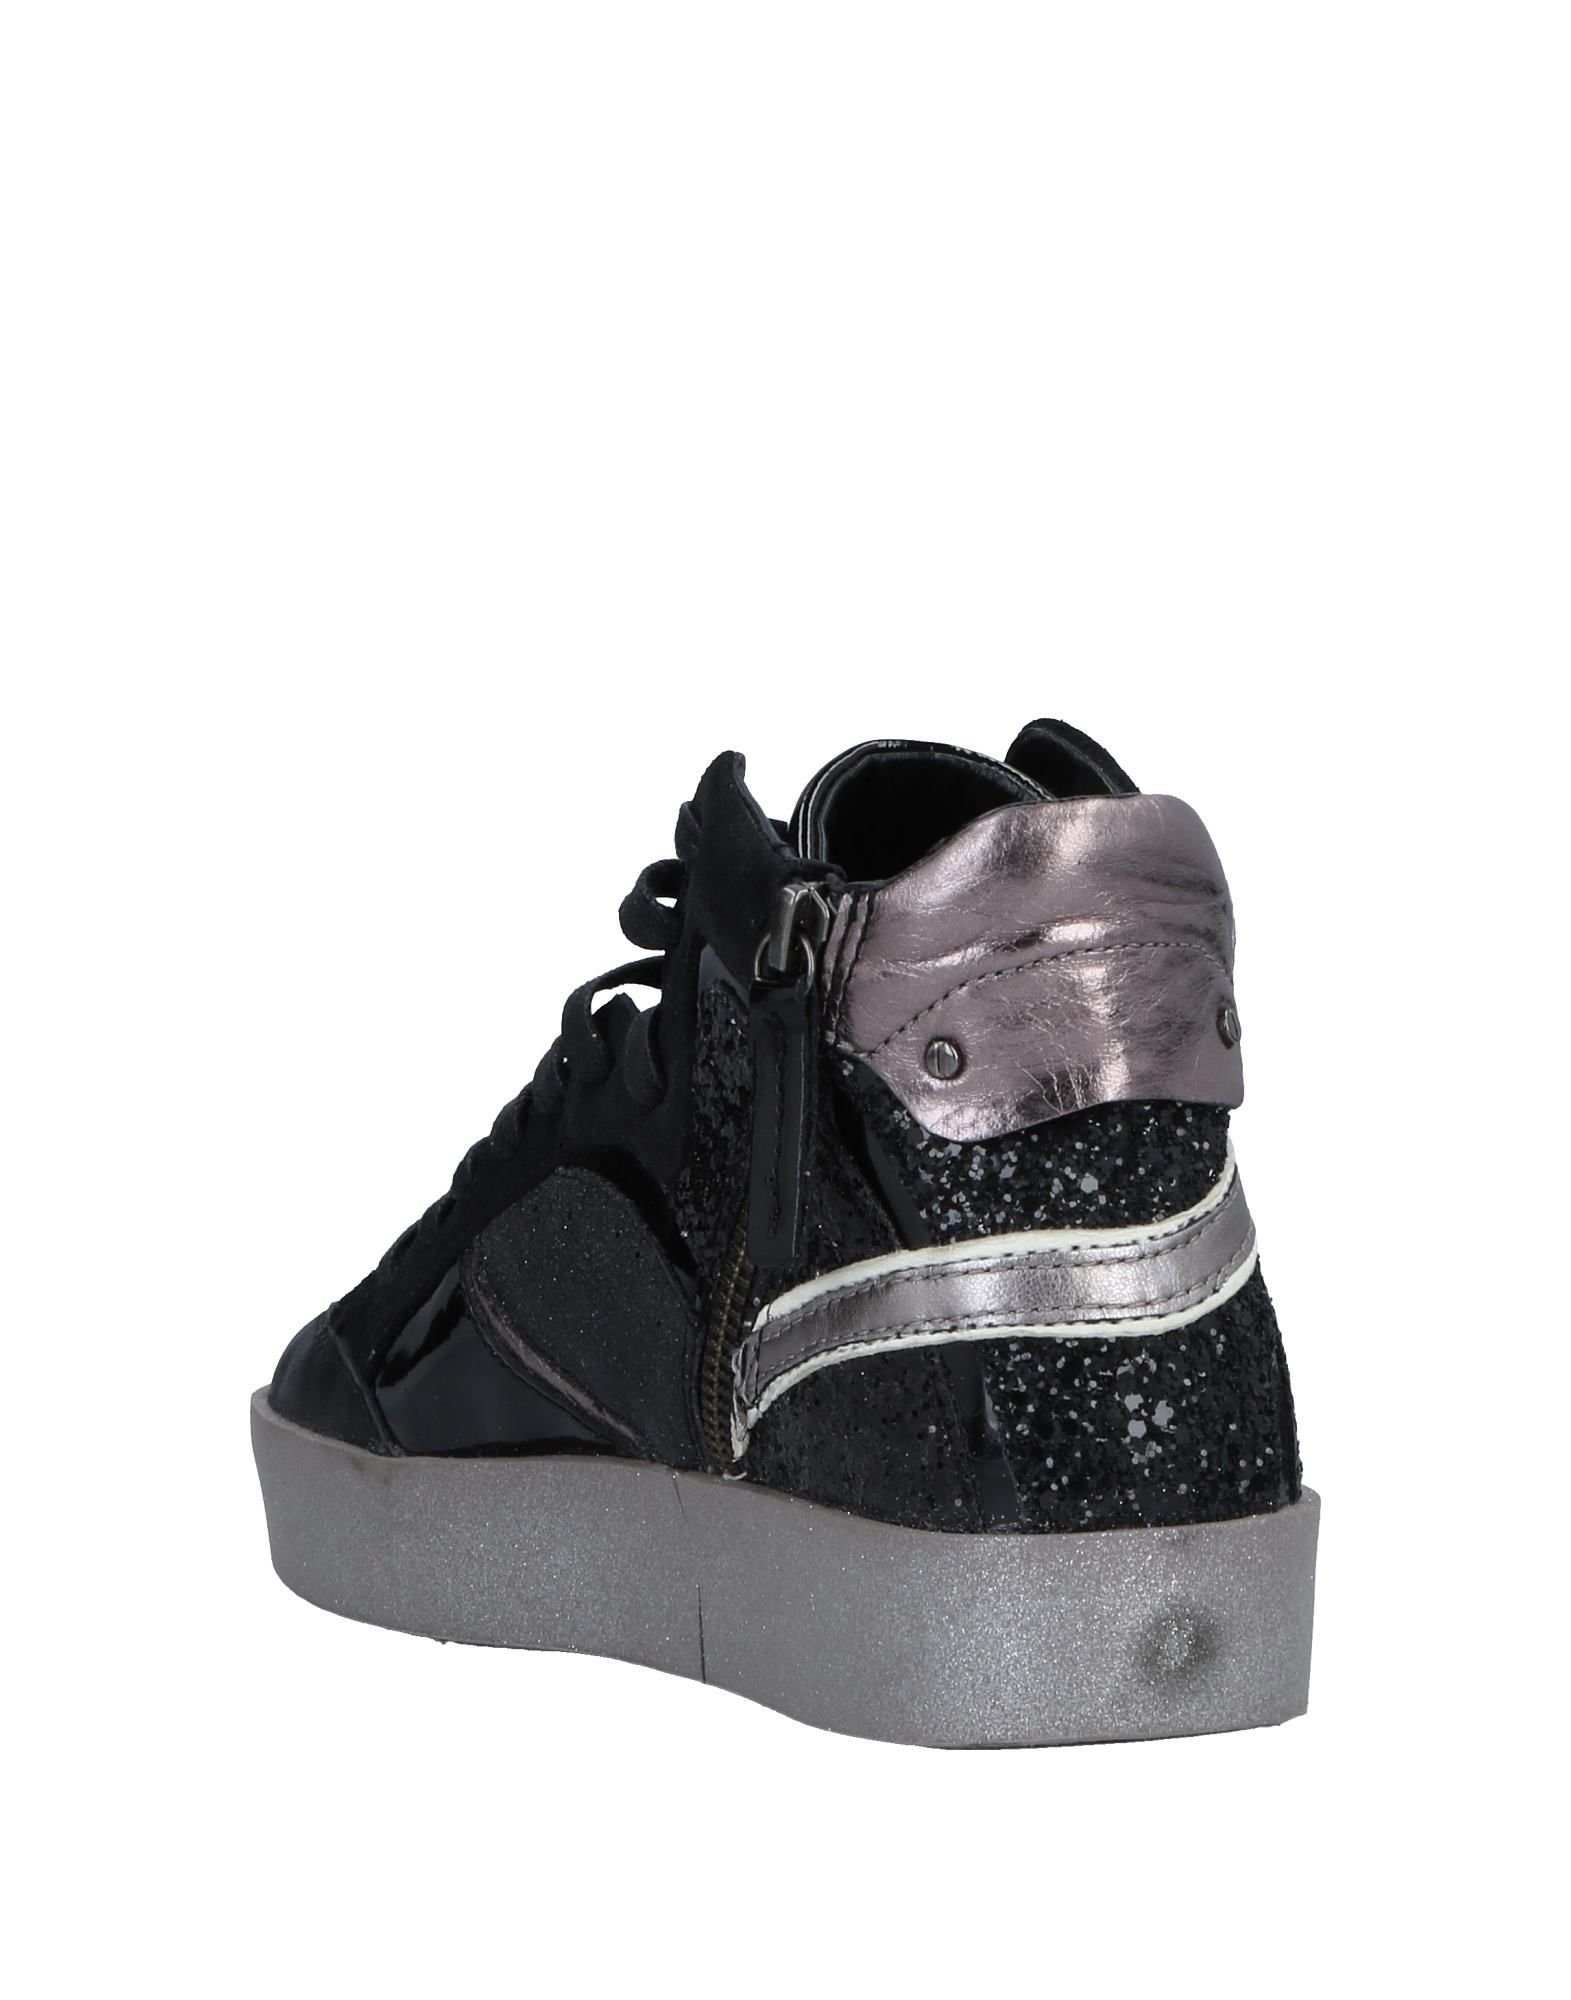 Crime London Gute Sneakers Damen  11521238EF Gute London Qualität beliebte Schuhe 126d09